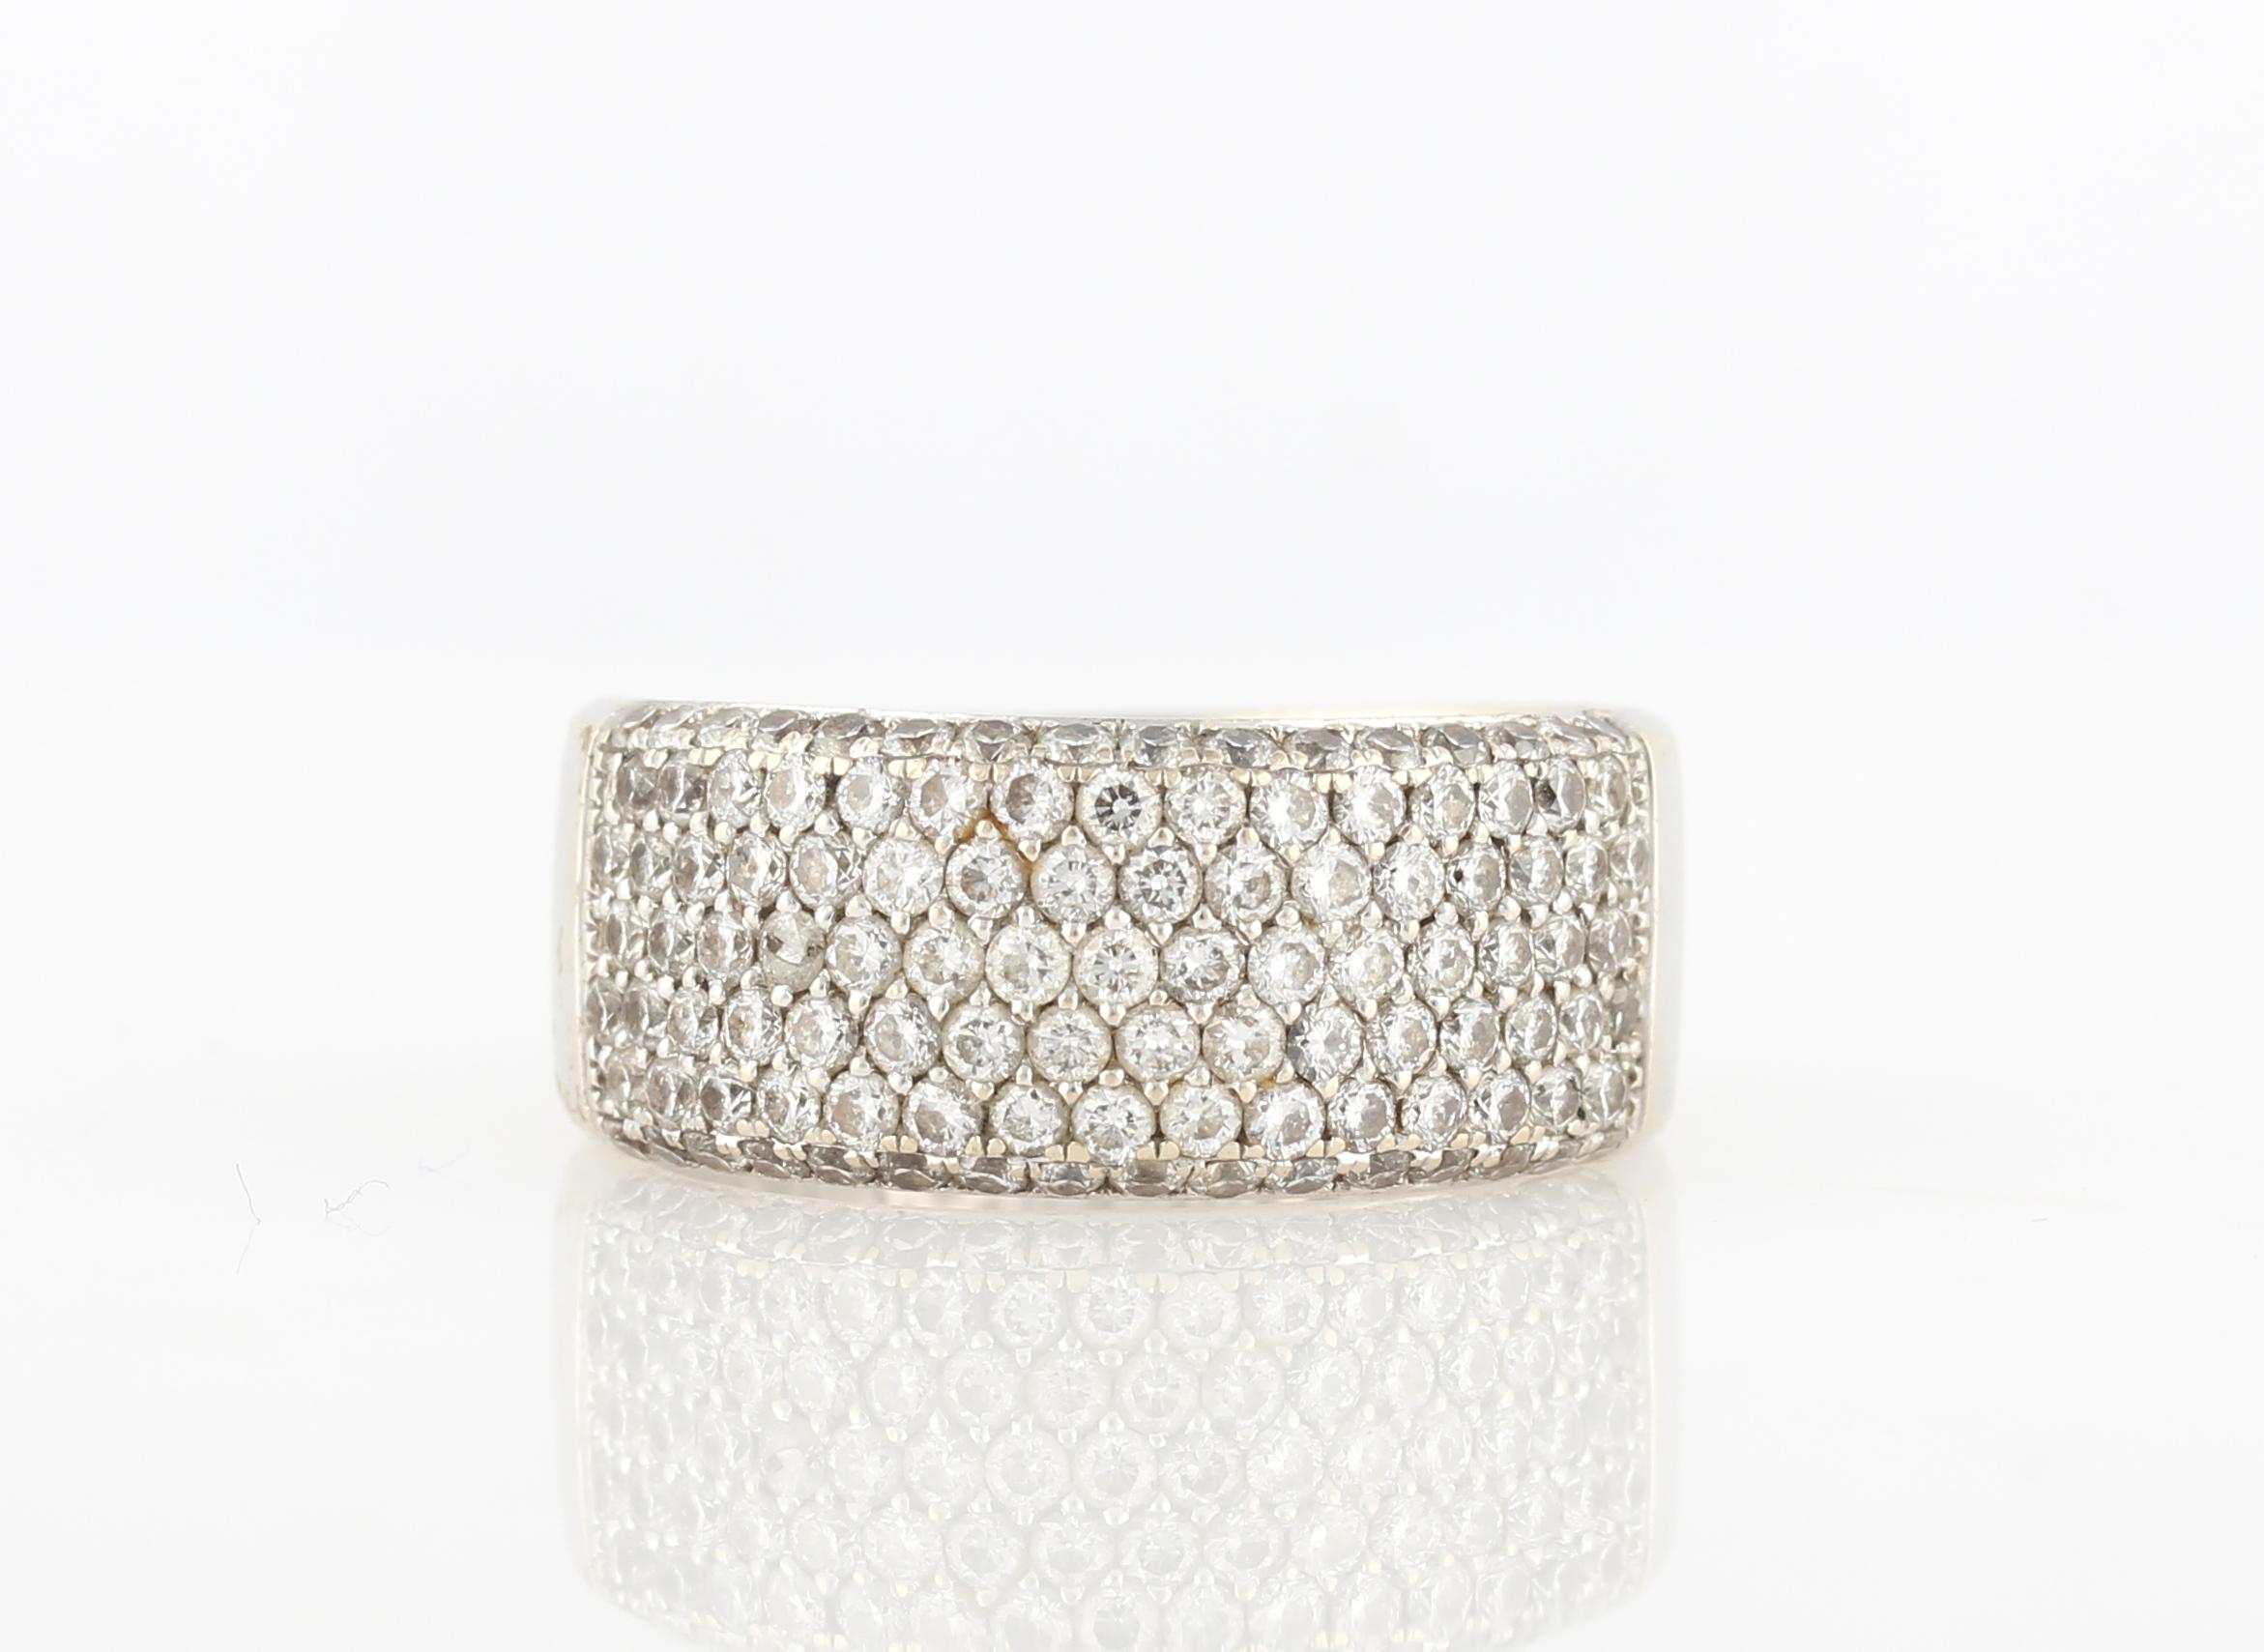 Lot 40 - A diamond half band, pavé set with seven rows of round brilliant cut diamonds, total diamond